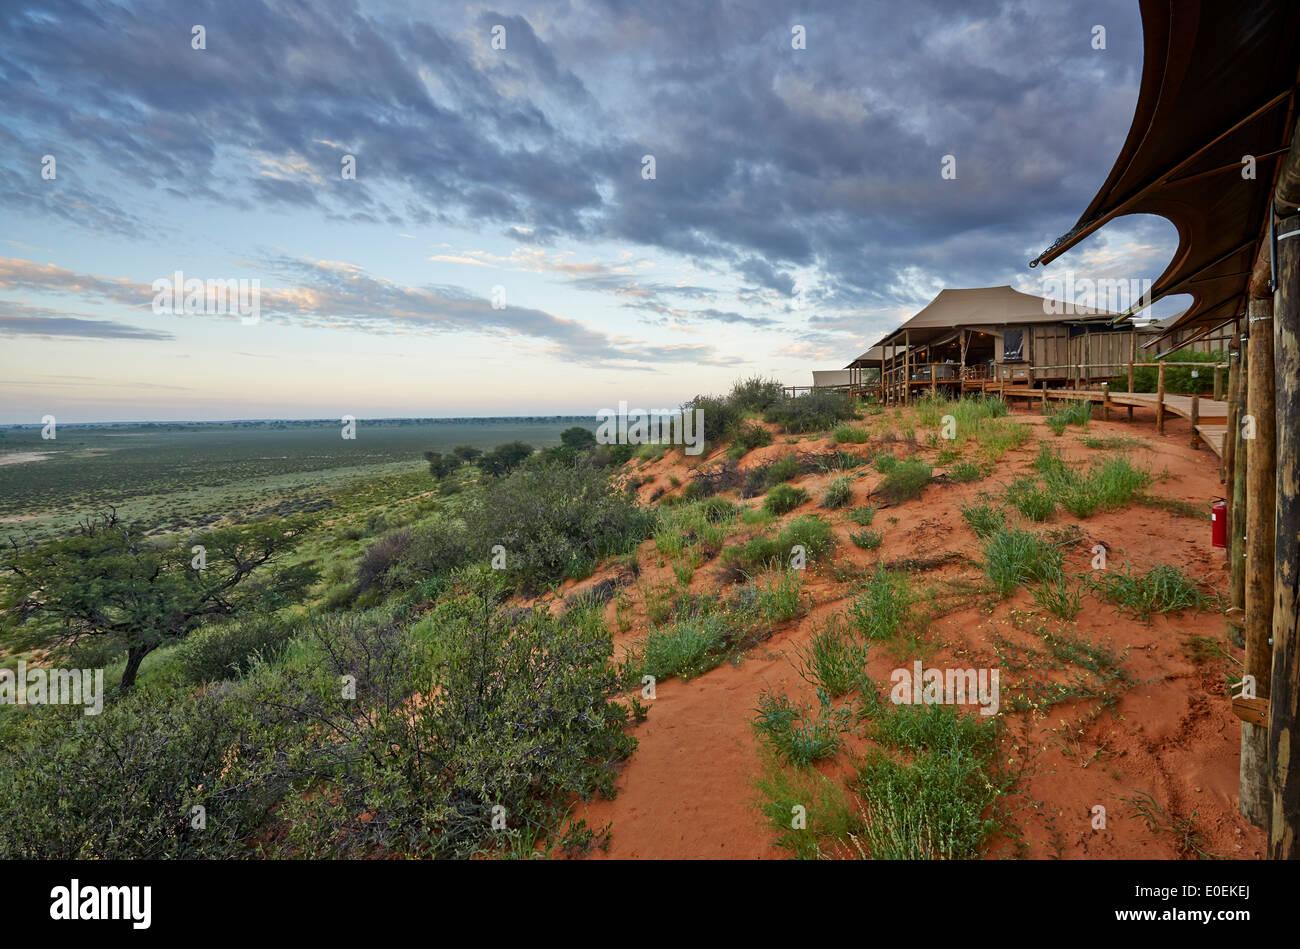 Polentswa Tented Camp, Kgalagadi Transfrontier Park, Kalahari, Südafrika, Botswana, Afrika Stockbild